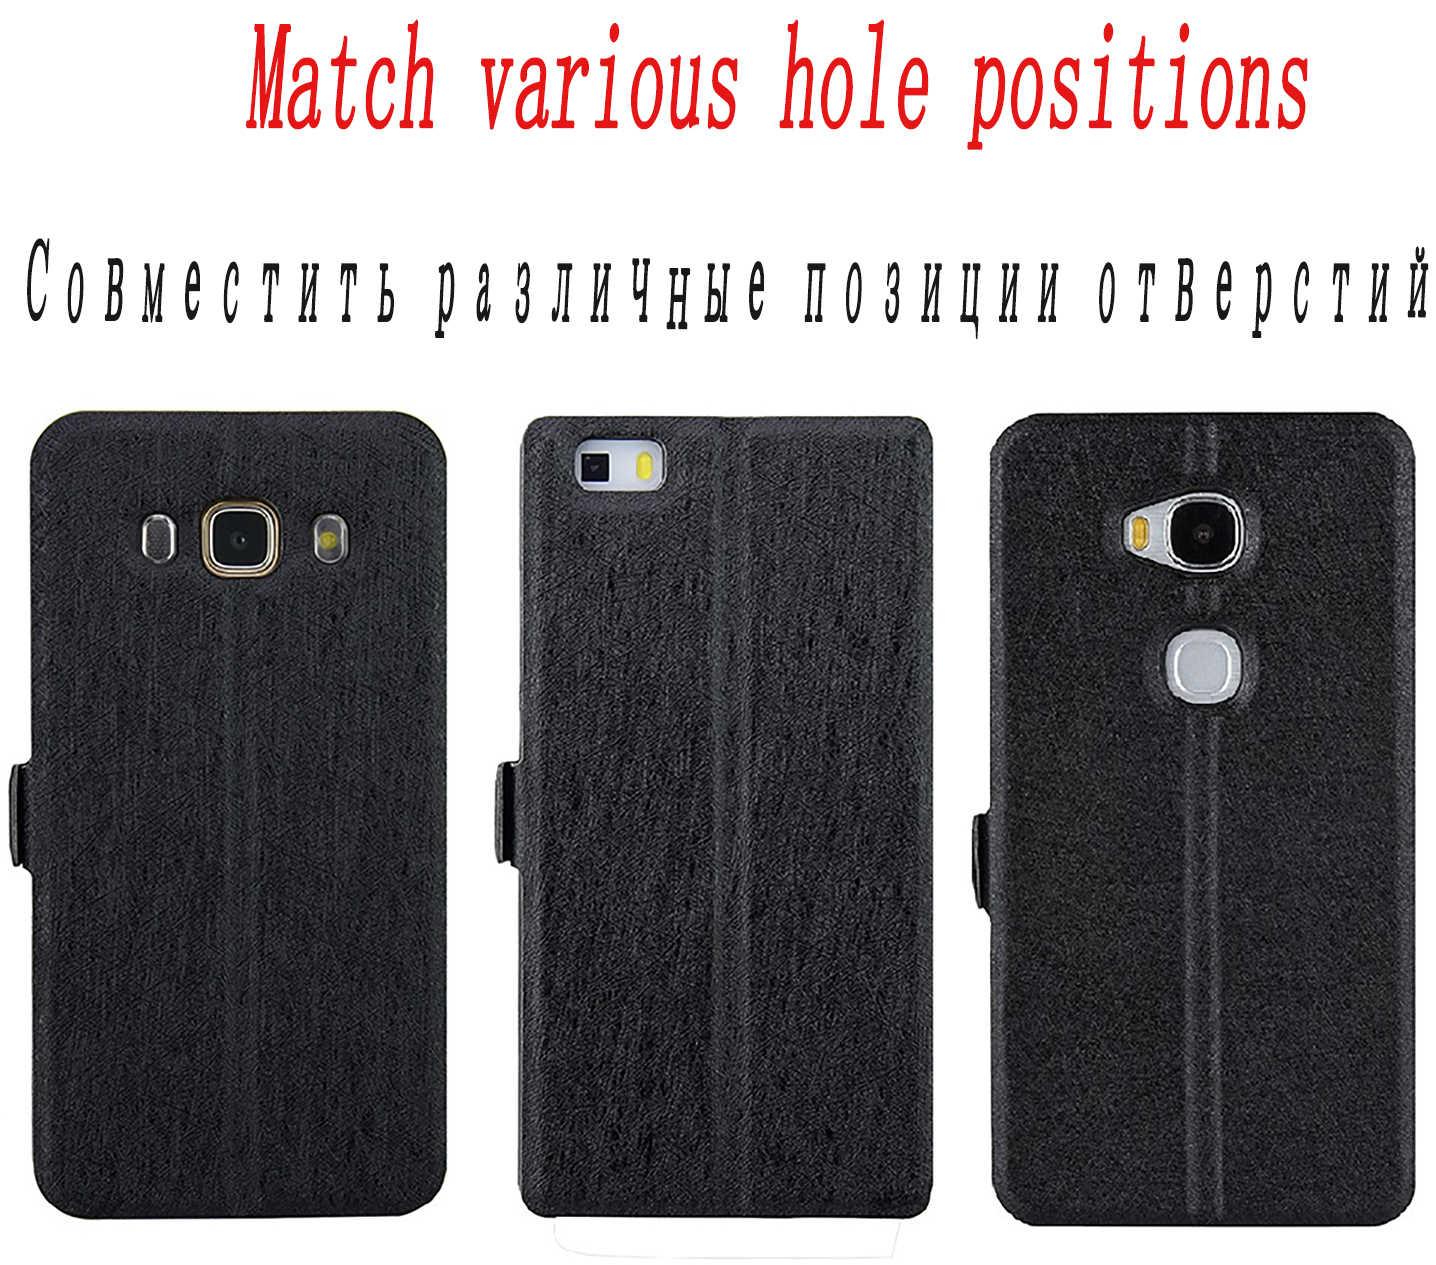 Dompet Kasus untuk Archos 50F Neon 60 Platinum Inti 55P 55 50P Berlian Alpha Plus Gamma Omega 47X phone Case Flip Cover Kulit